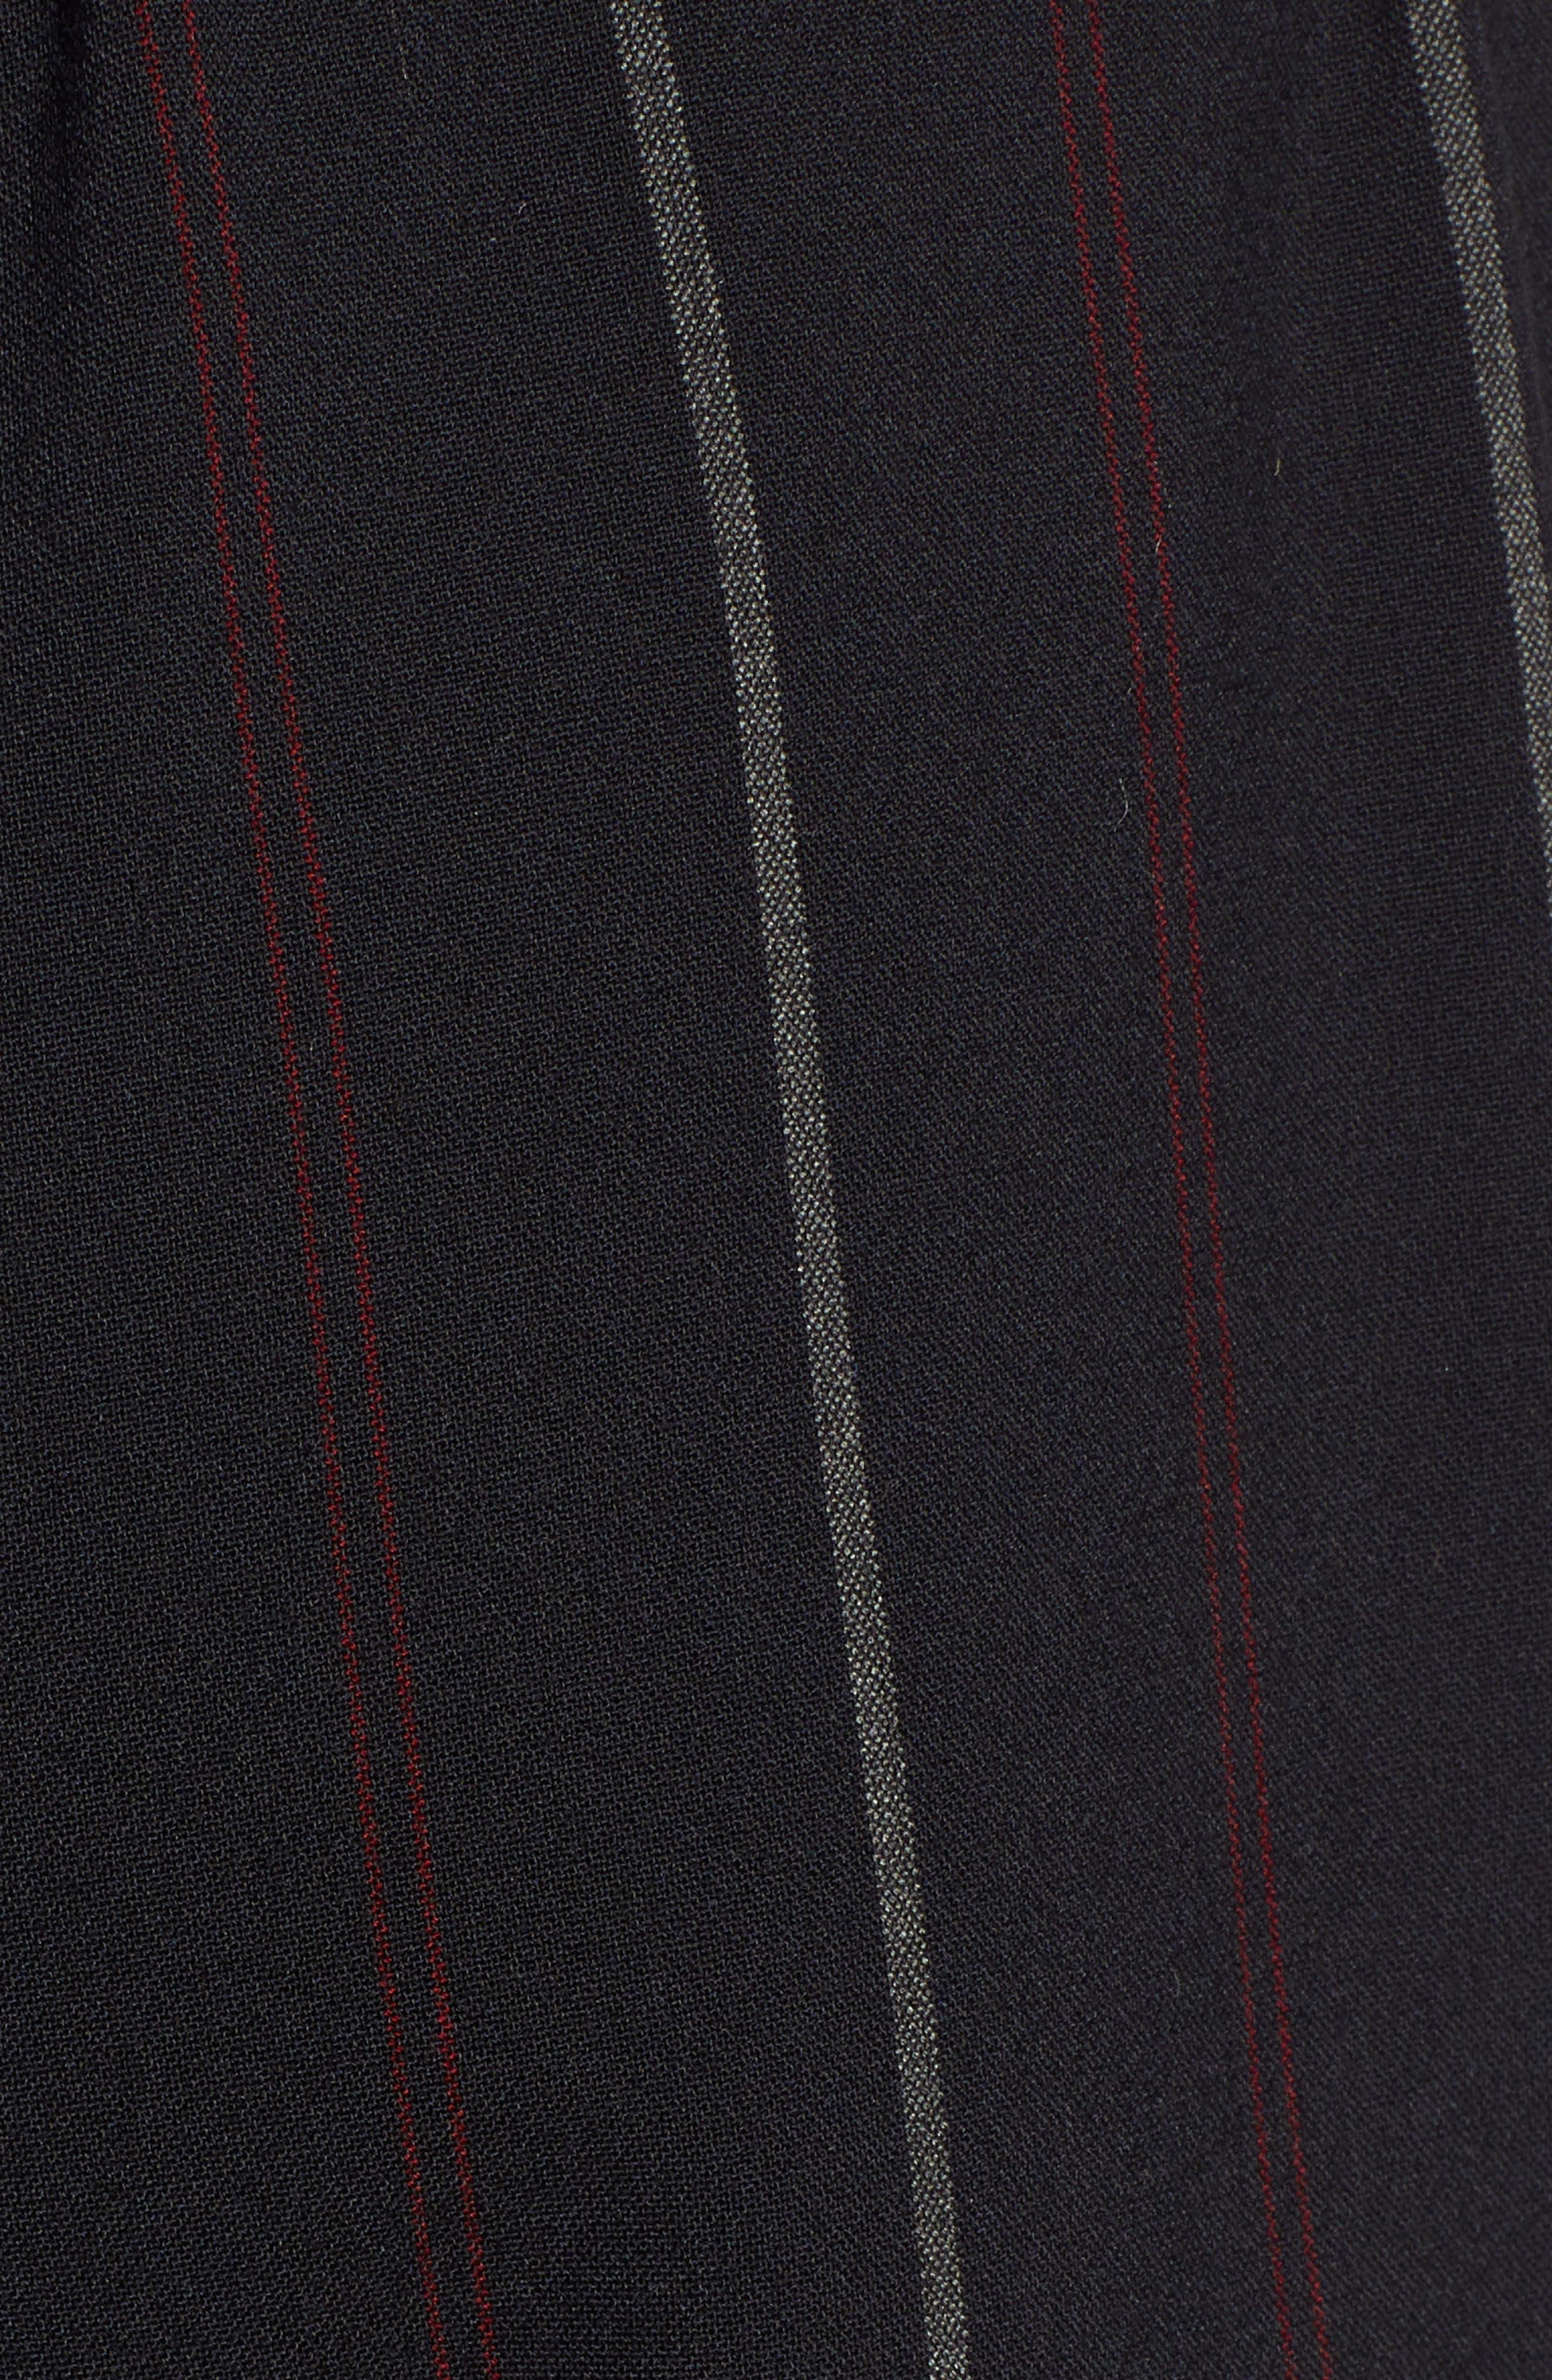 Wide Leg Track Pants,                             Alternate thumbnail 5, color,                             BLACK SHIRLIE STRIPE